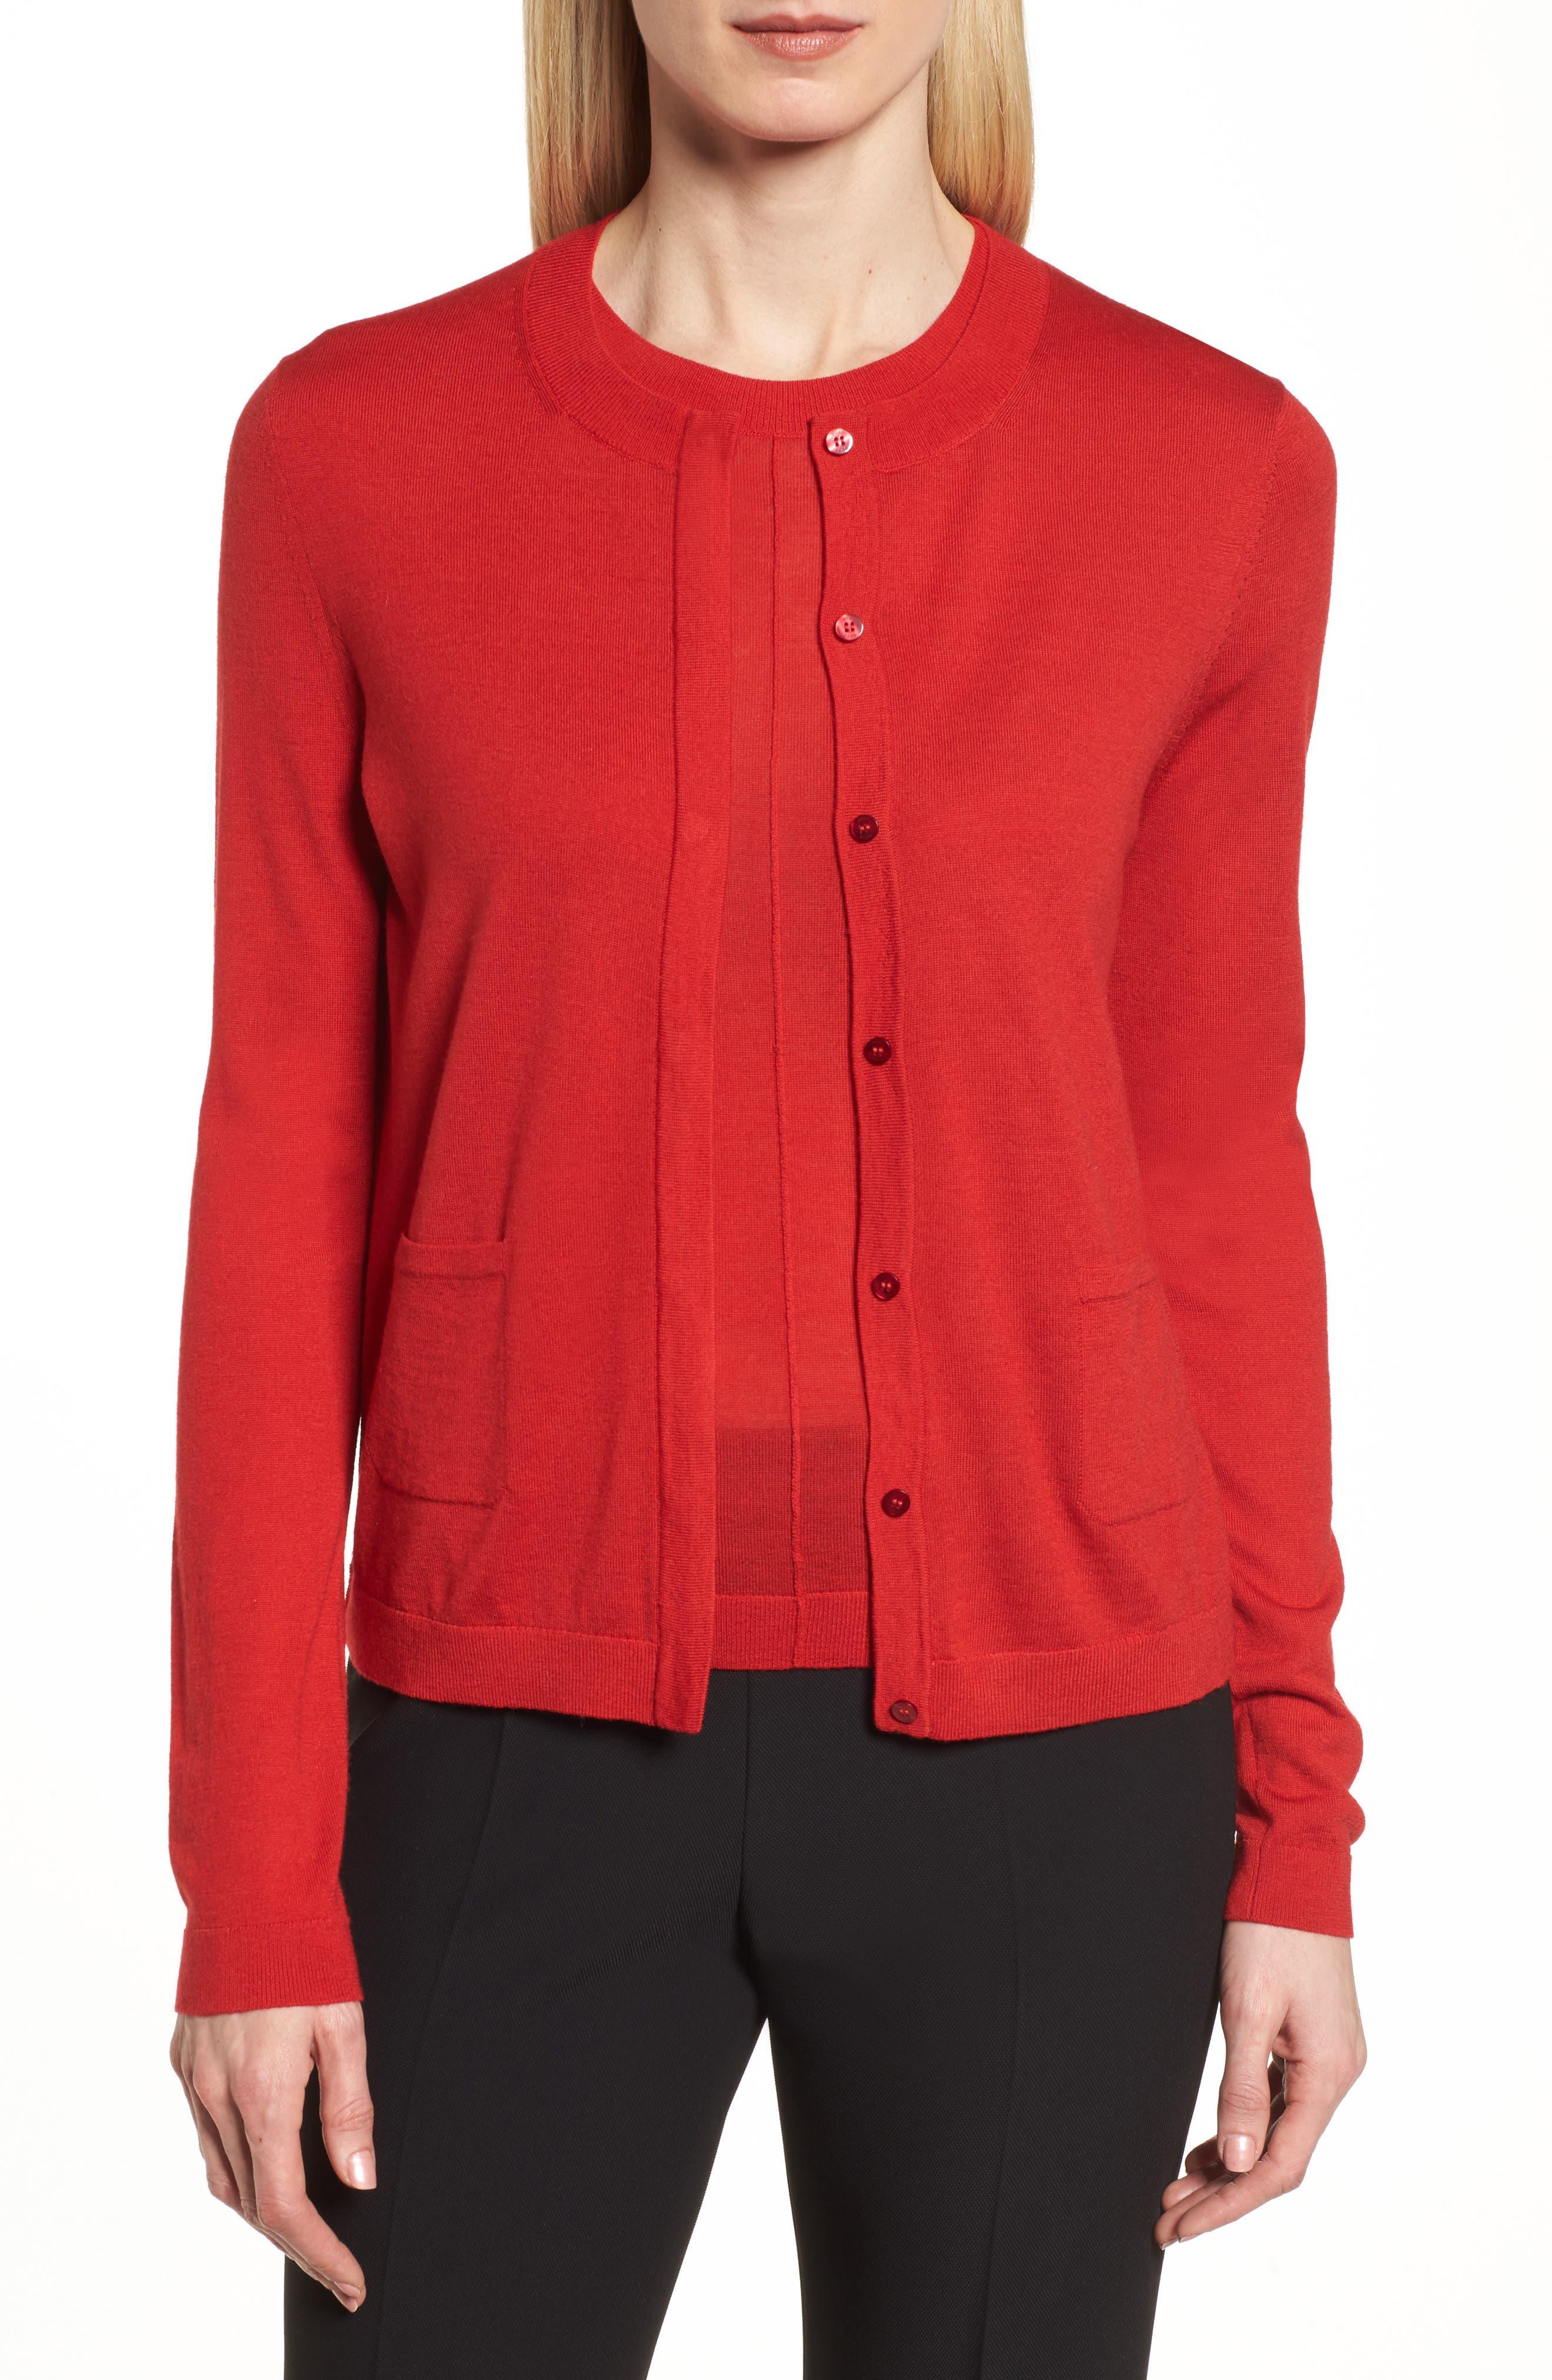 Fuyuma Wool Cardigan,                             Main thumbnail 1, color,                             Crimson Red